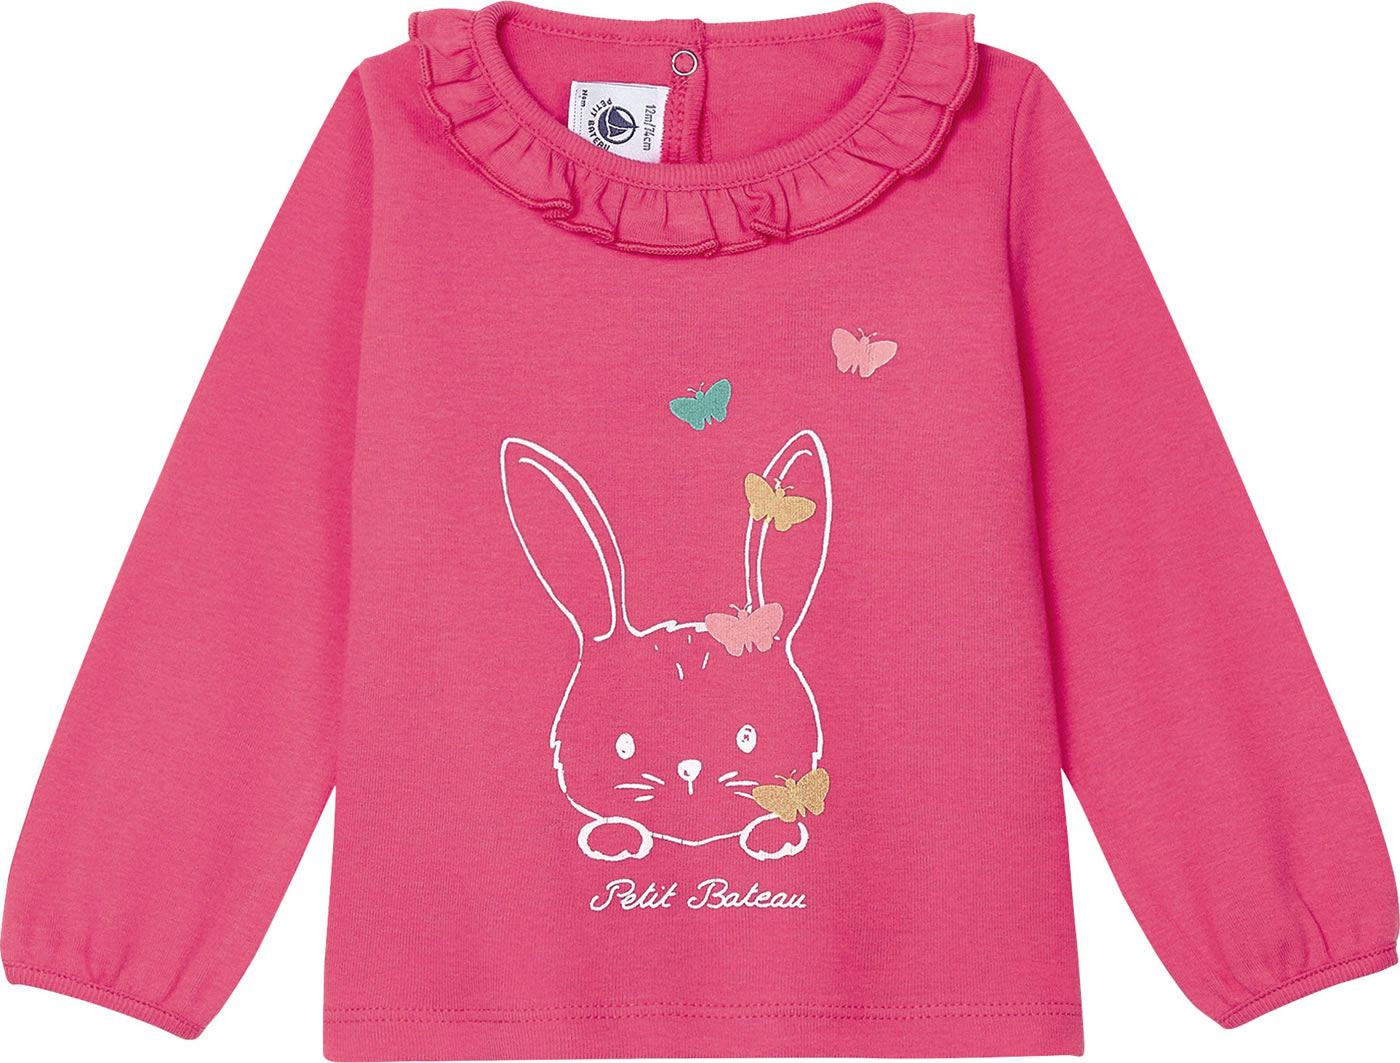 Petit Bateau Shirt for girls long rabbit sleeve pink 52844 02